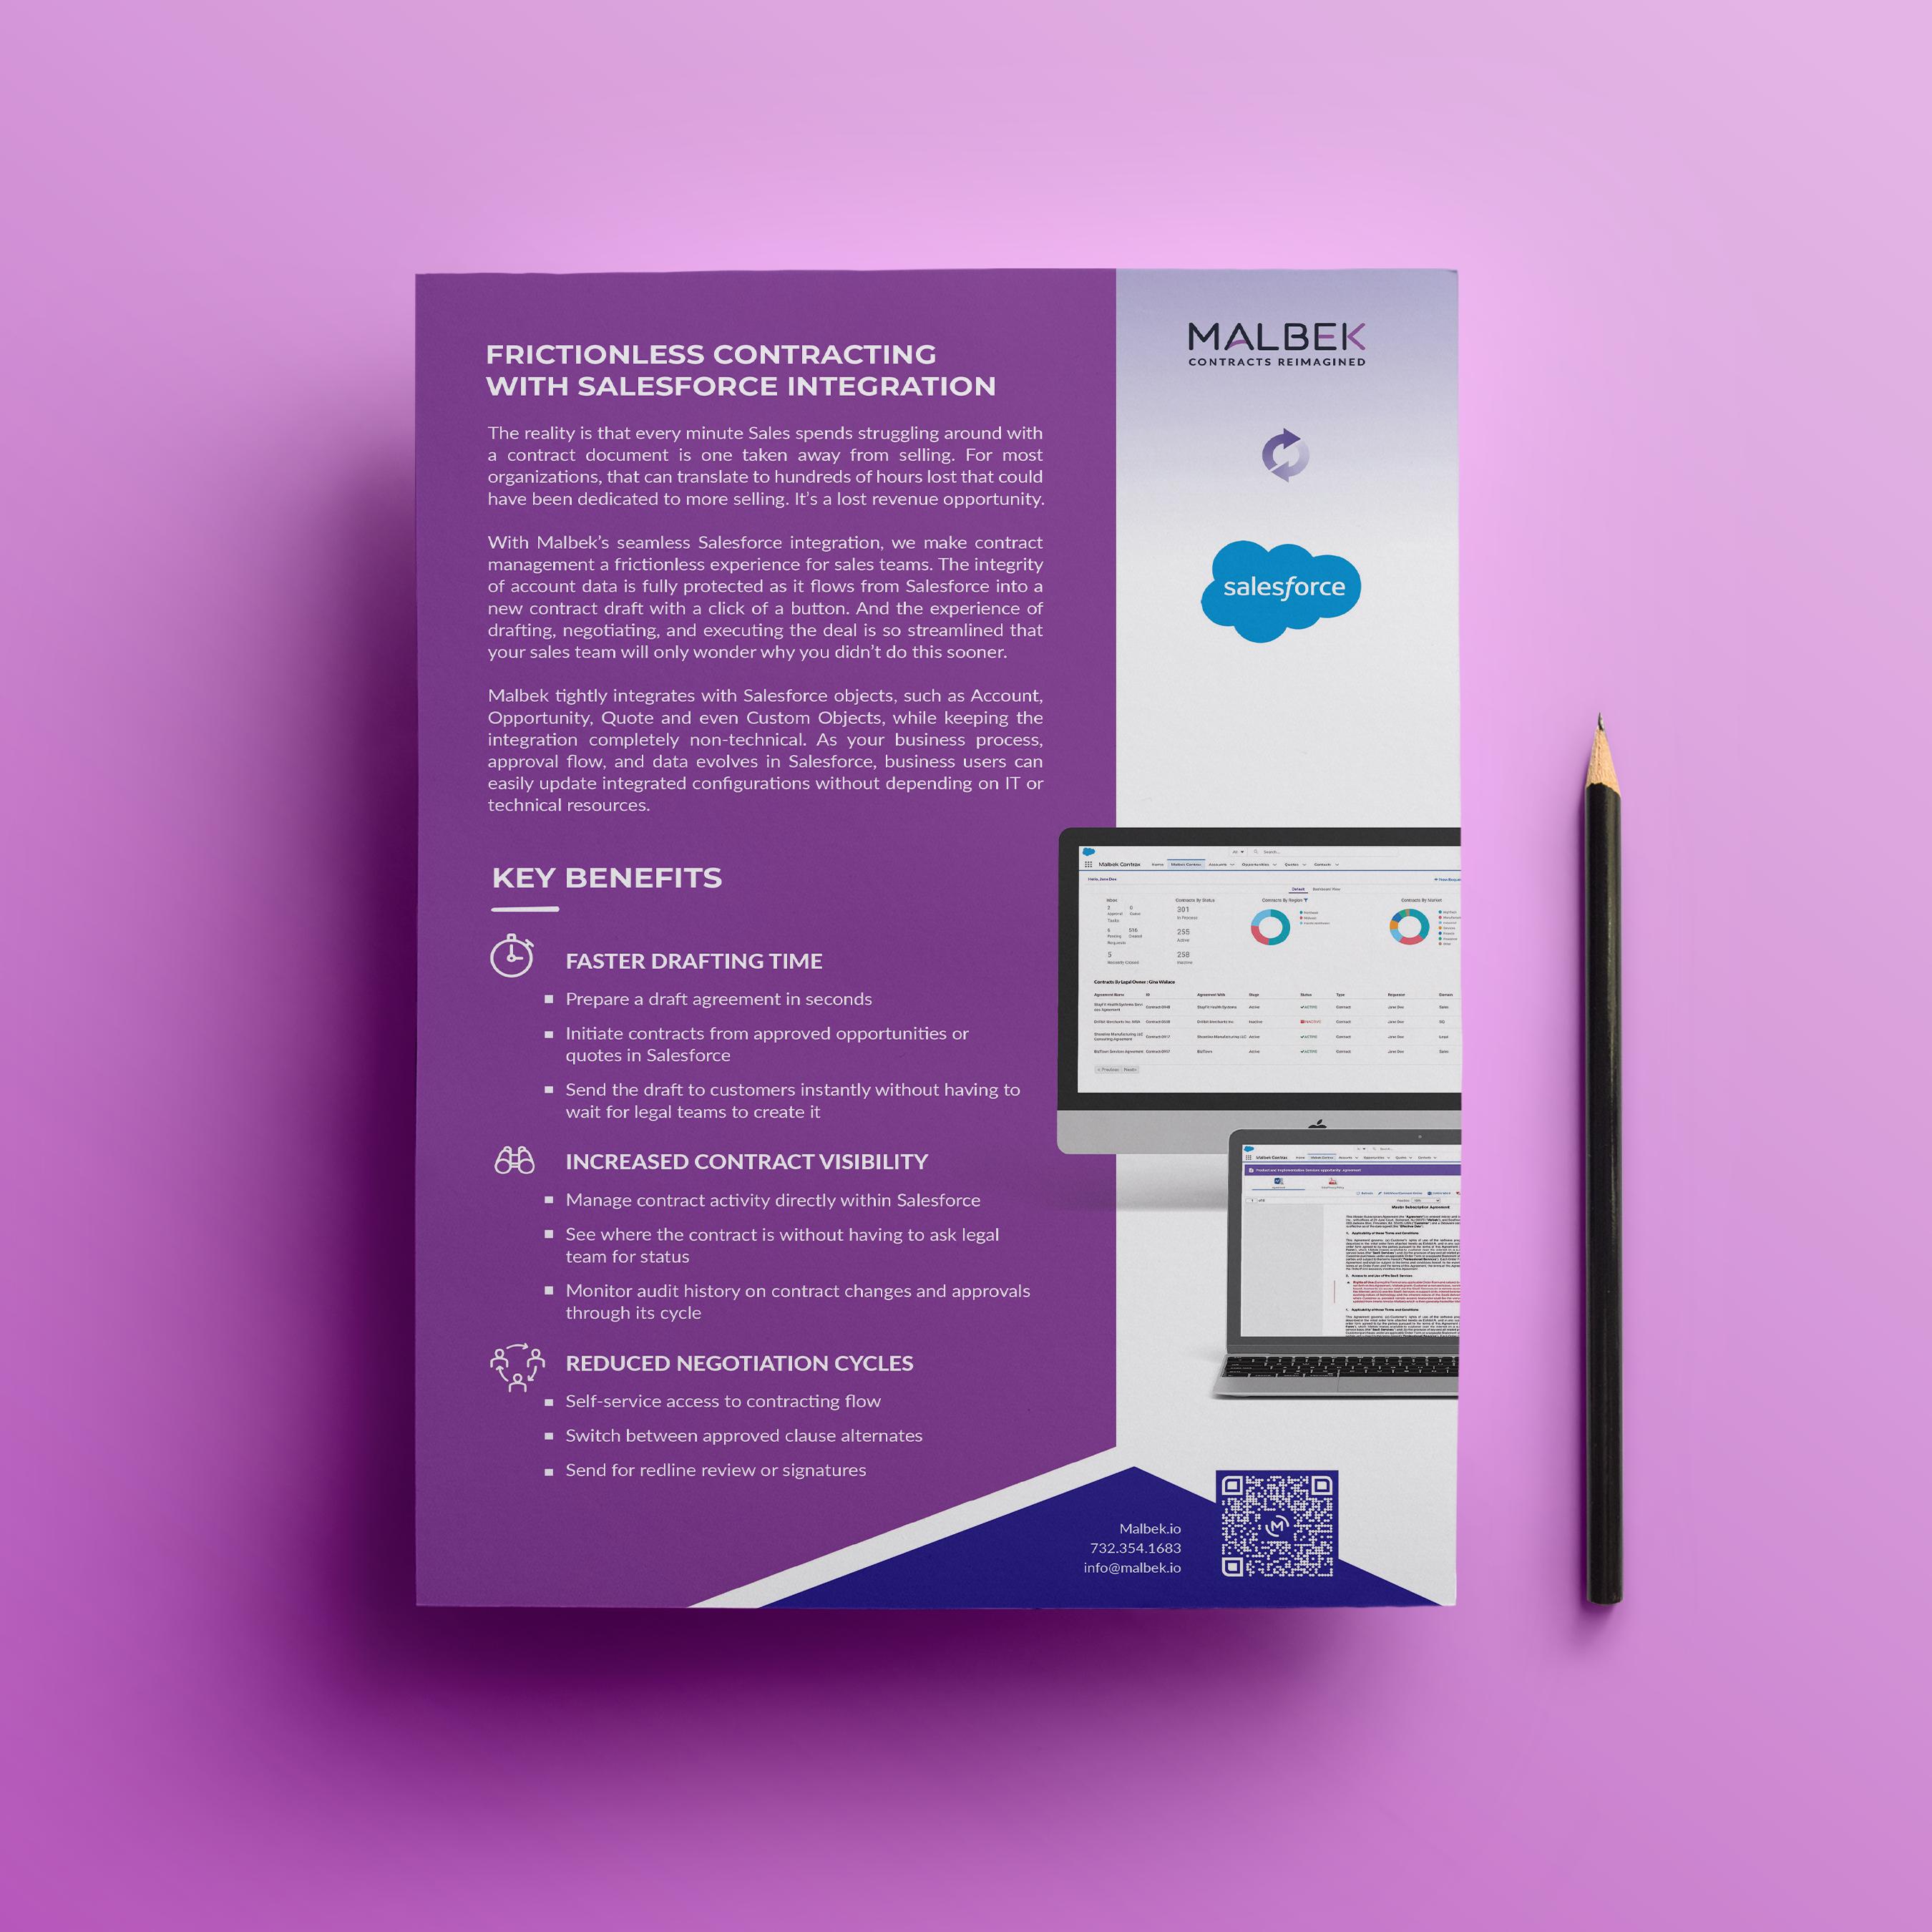 Malbek Contract Management Salesforce Integration